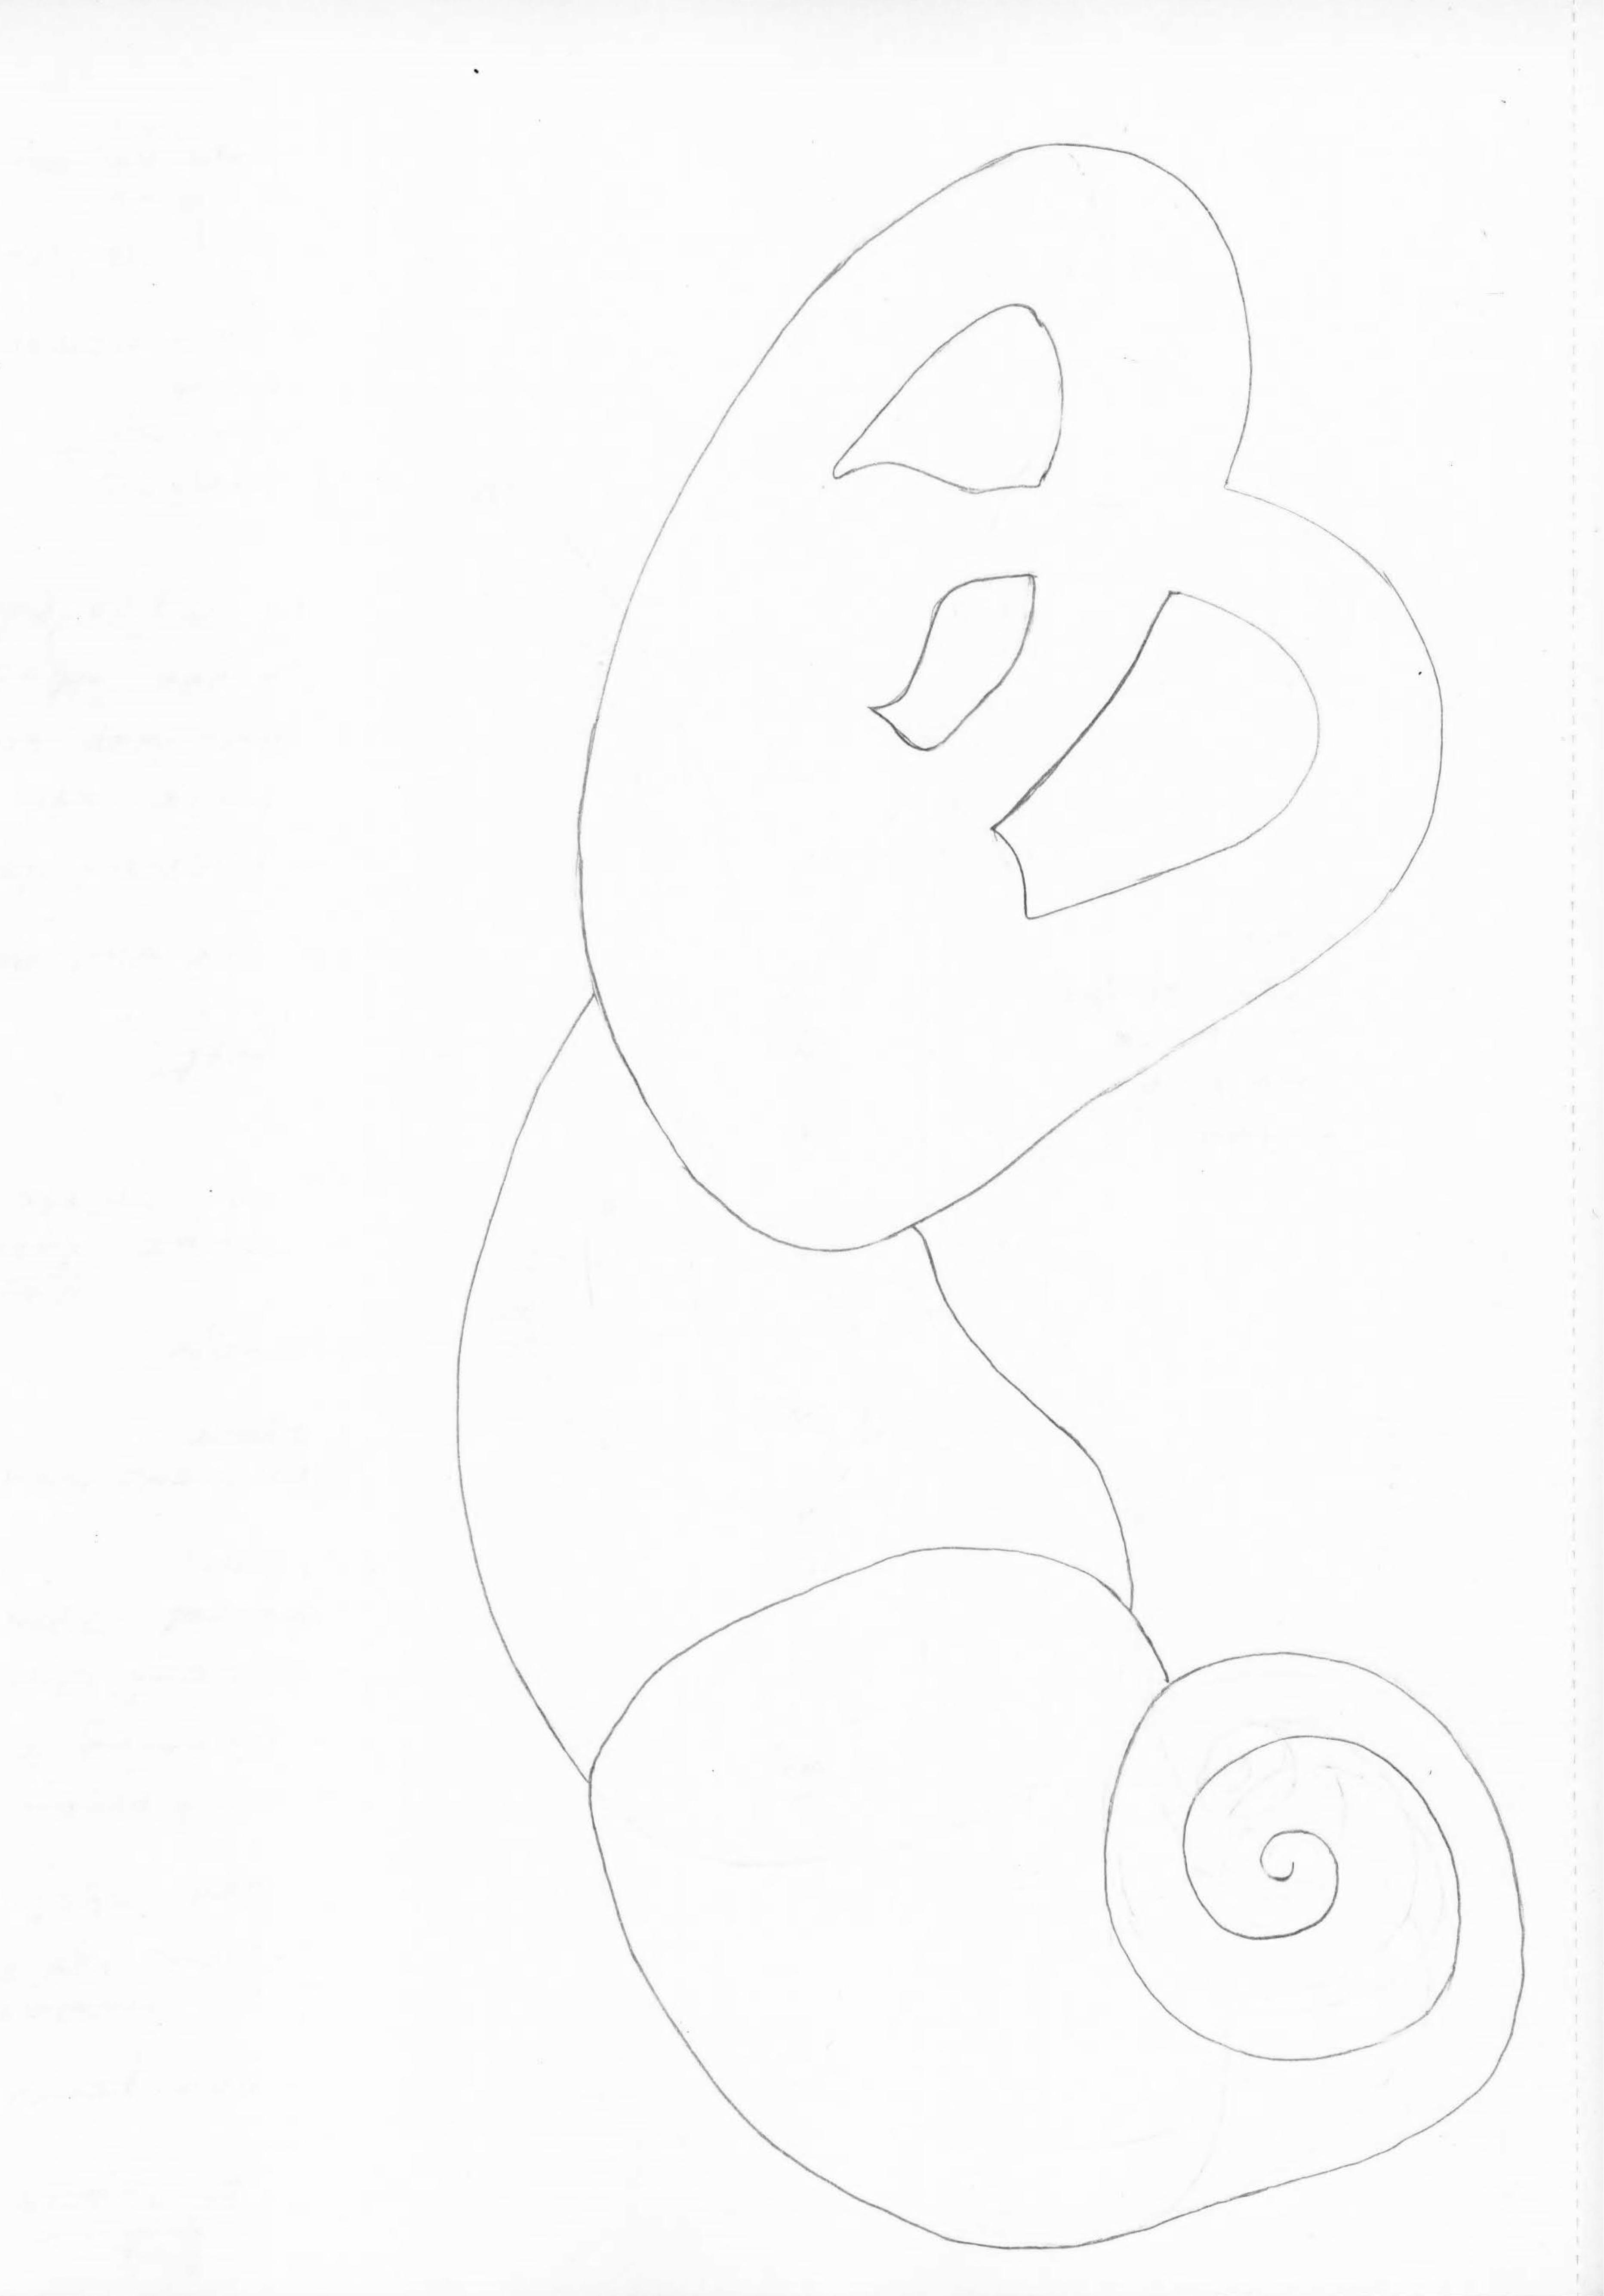 Georgia Sagri, Soma in orgasm as ear, 2017, pencil on paper, 29.5 × 20 cm